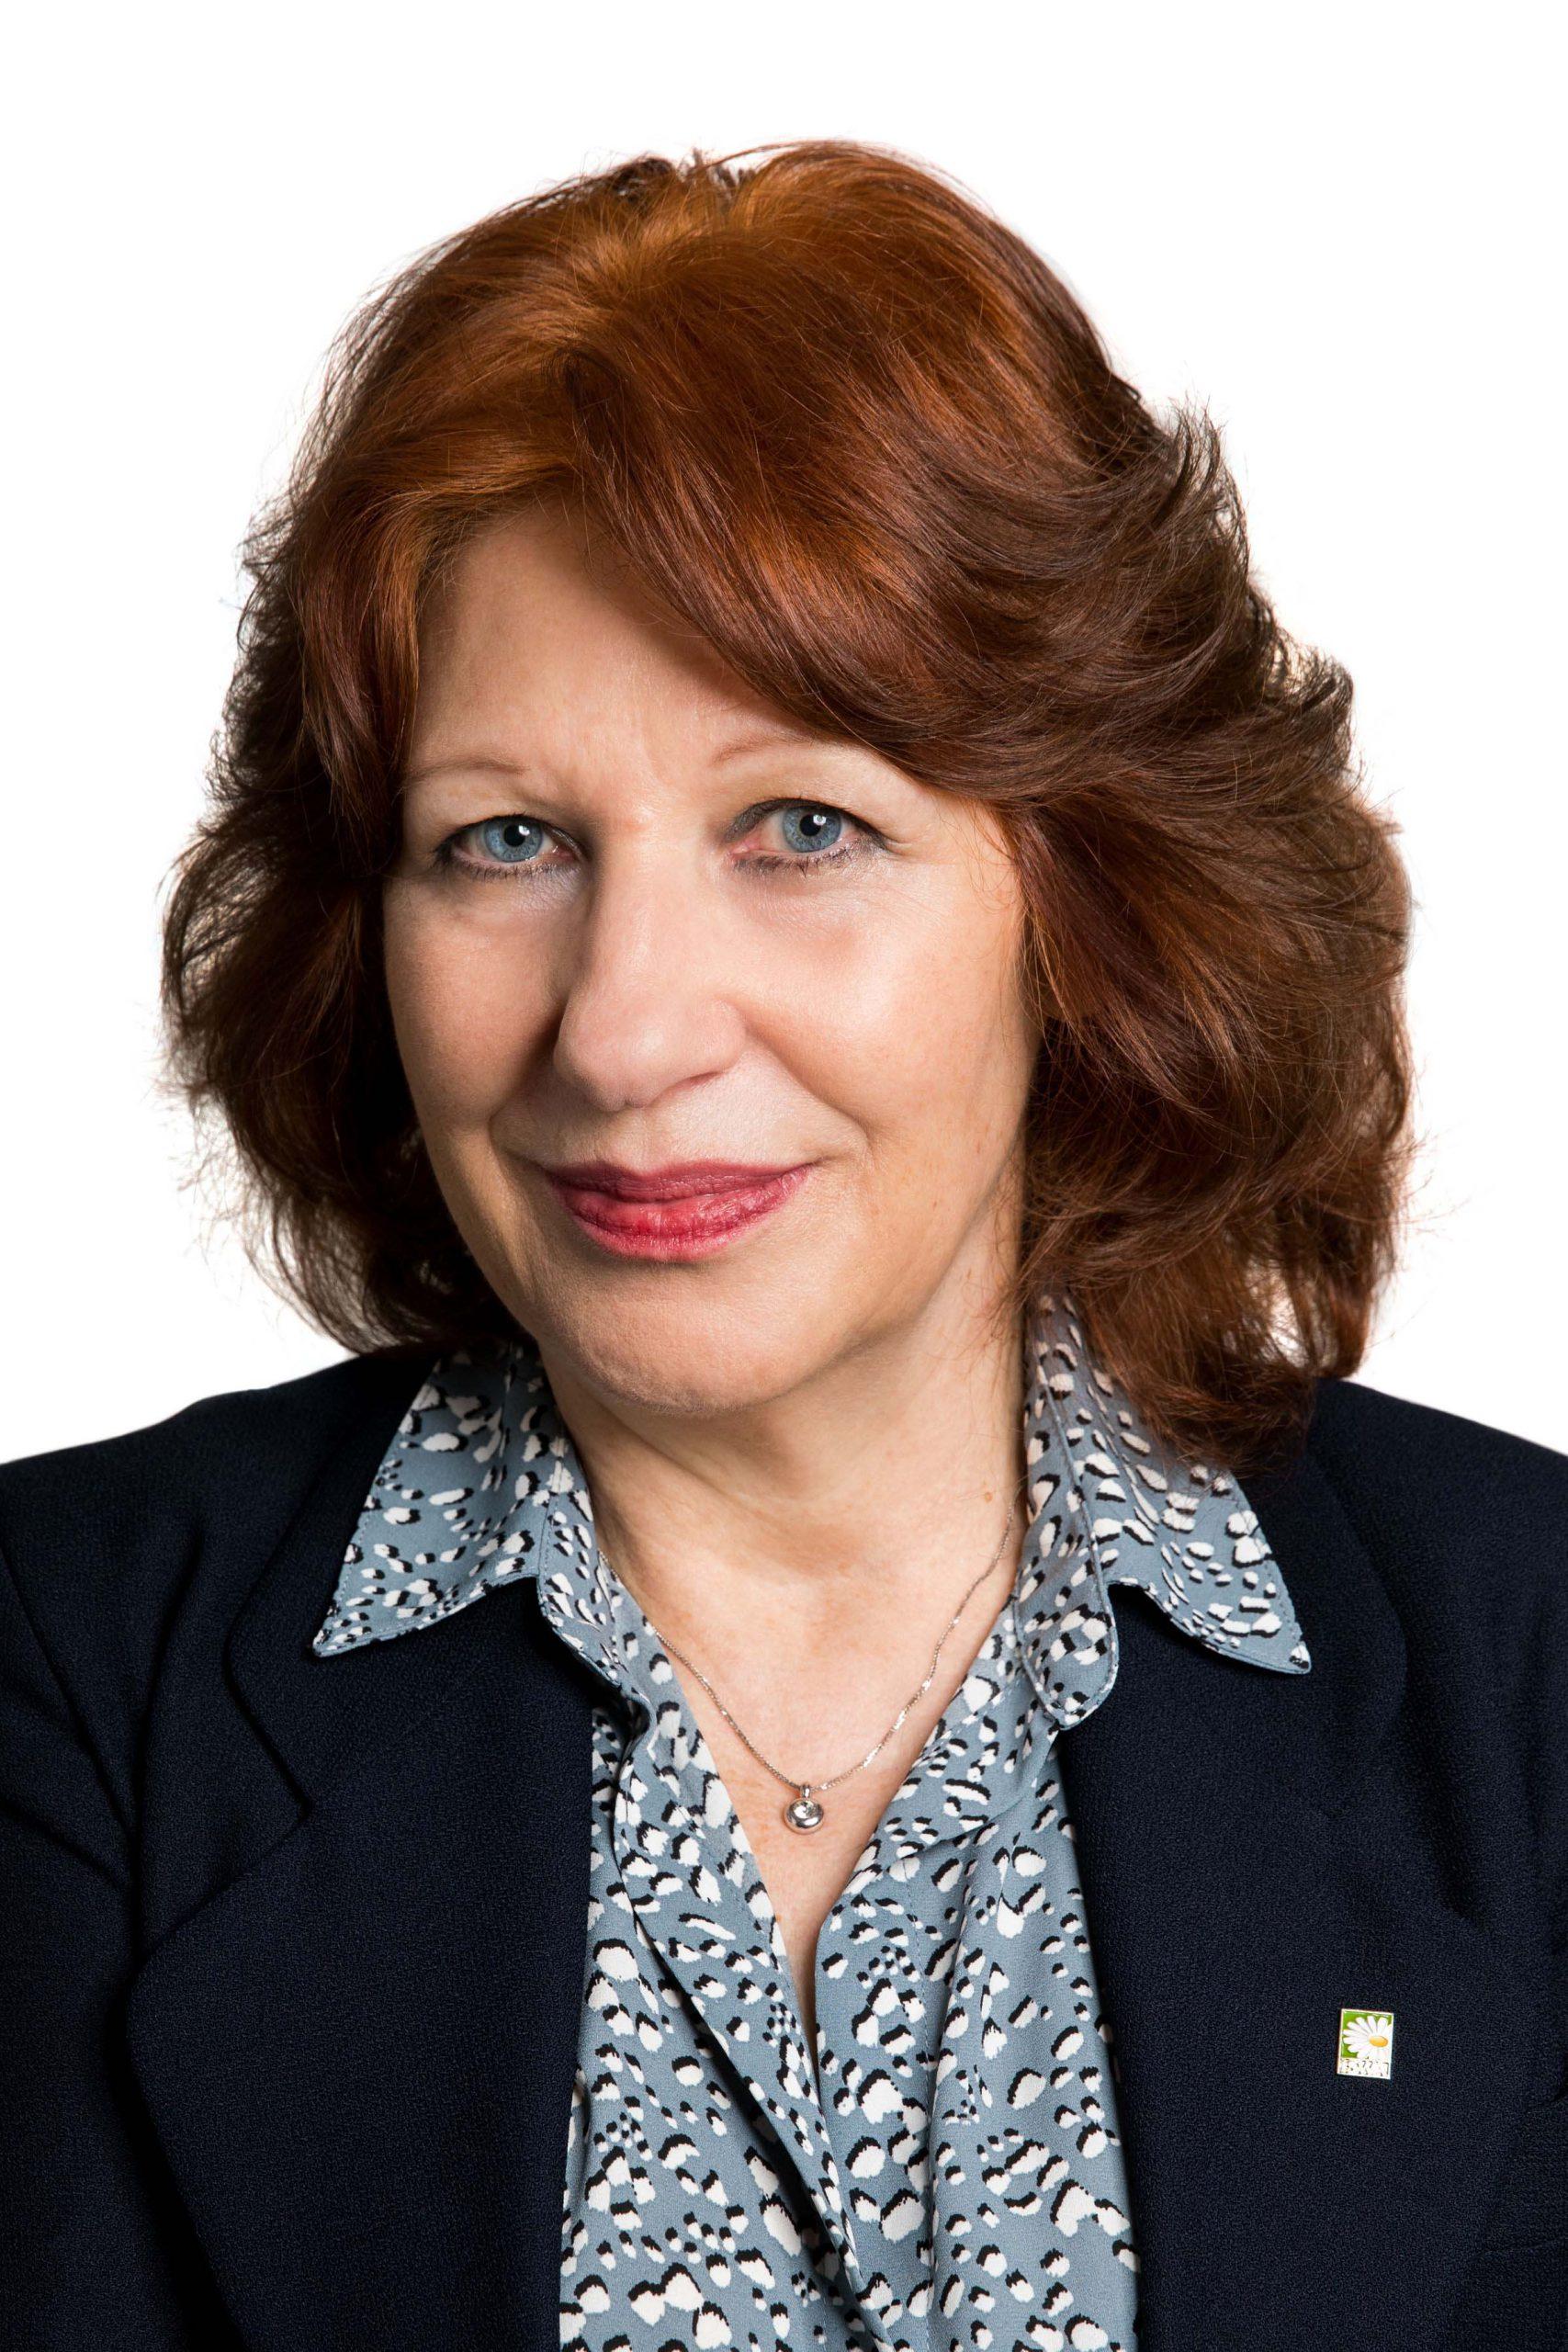 Mariana Tzaribacheva